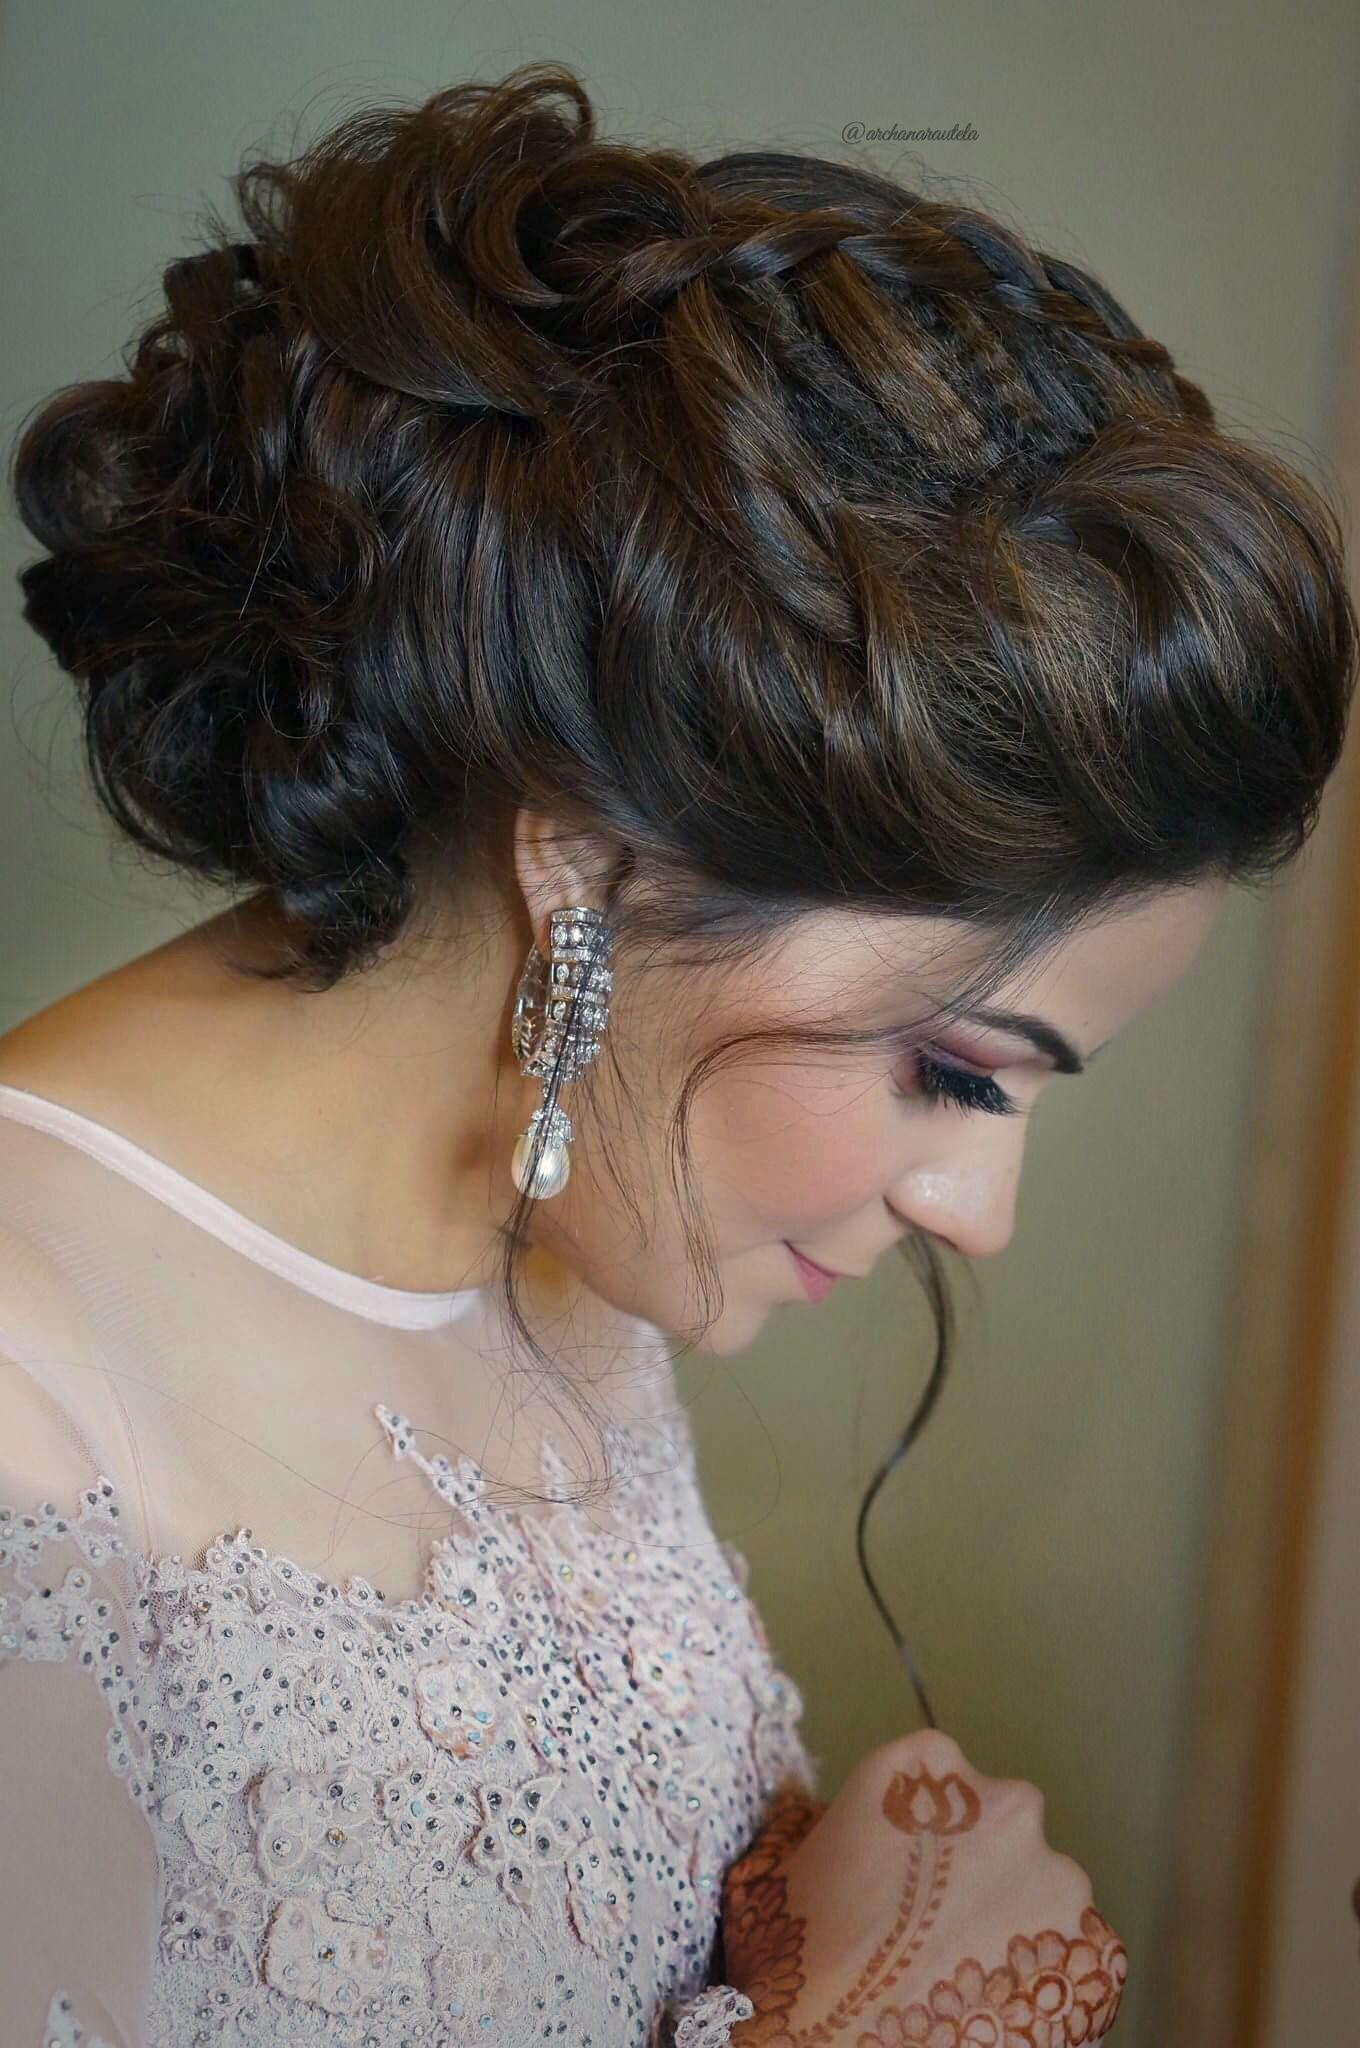 Pinterest: @cutipieanu | Messy bun hairstyles, Bun hairstyles, Indian party hairstyles